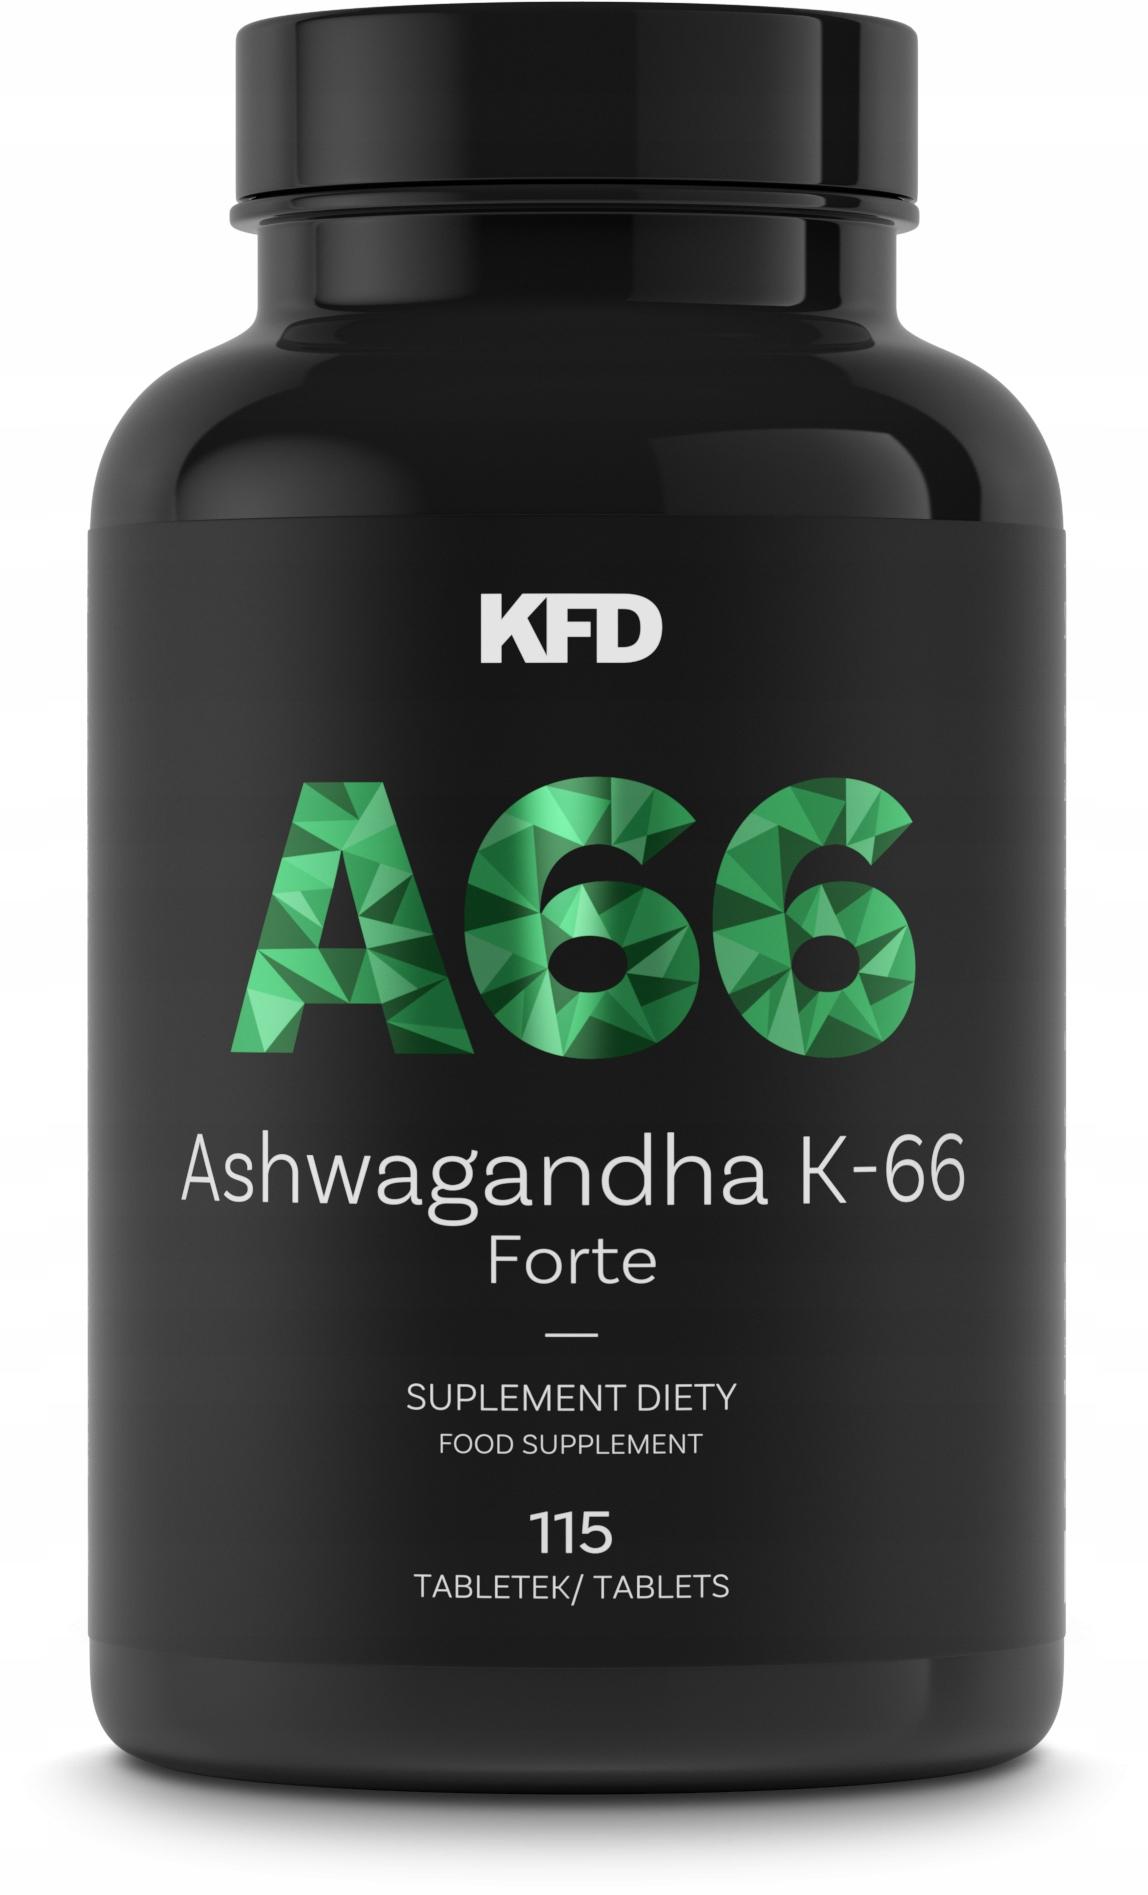 KFD ASHWAGANDHA K-66 FORTE - AŻ 230 PORCJI